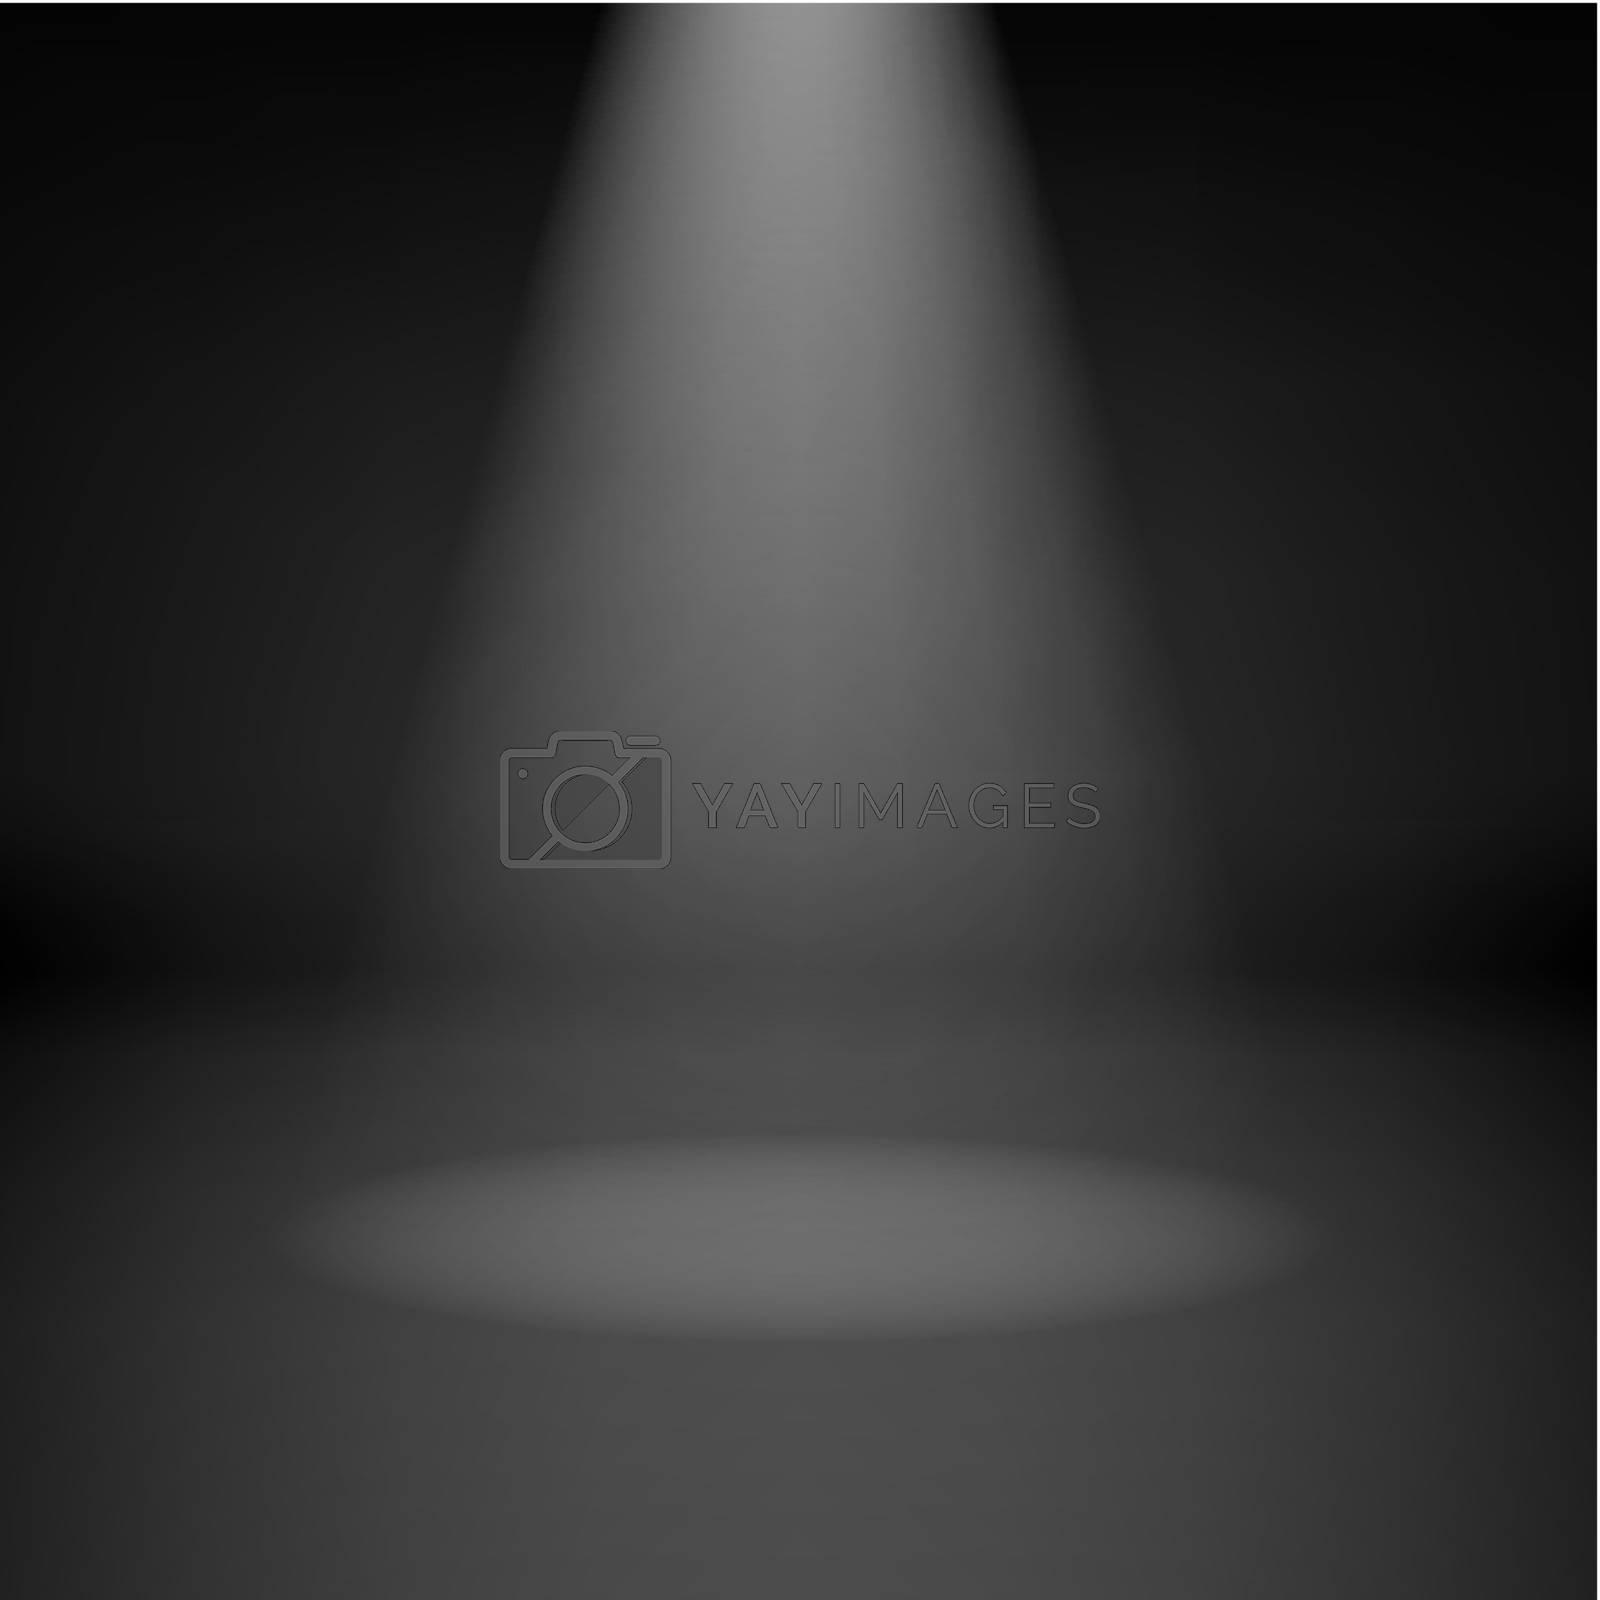 Royalty free image of Empty dark room with spotlight by dvarg